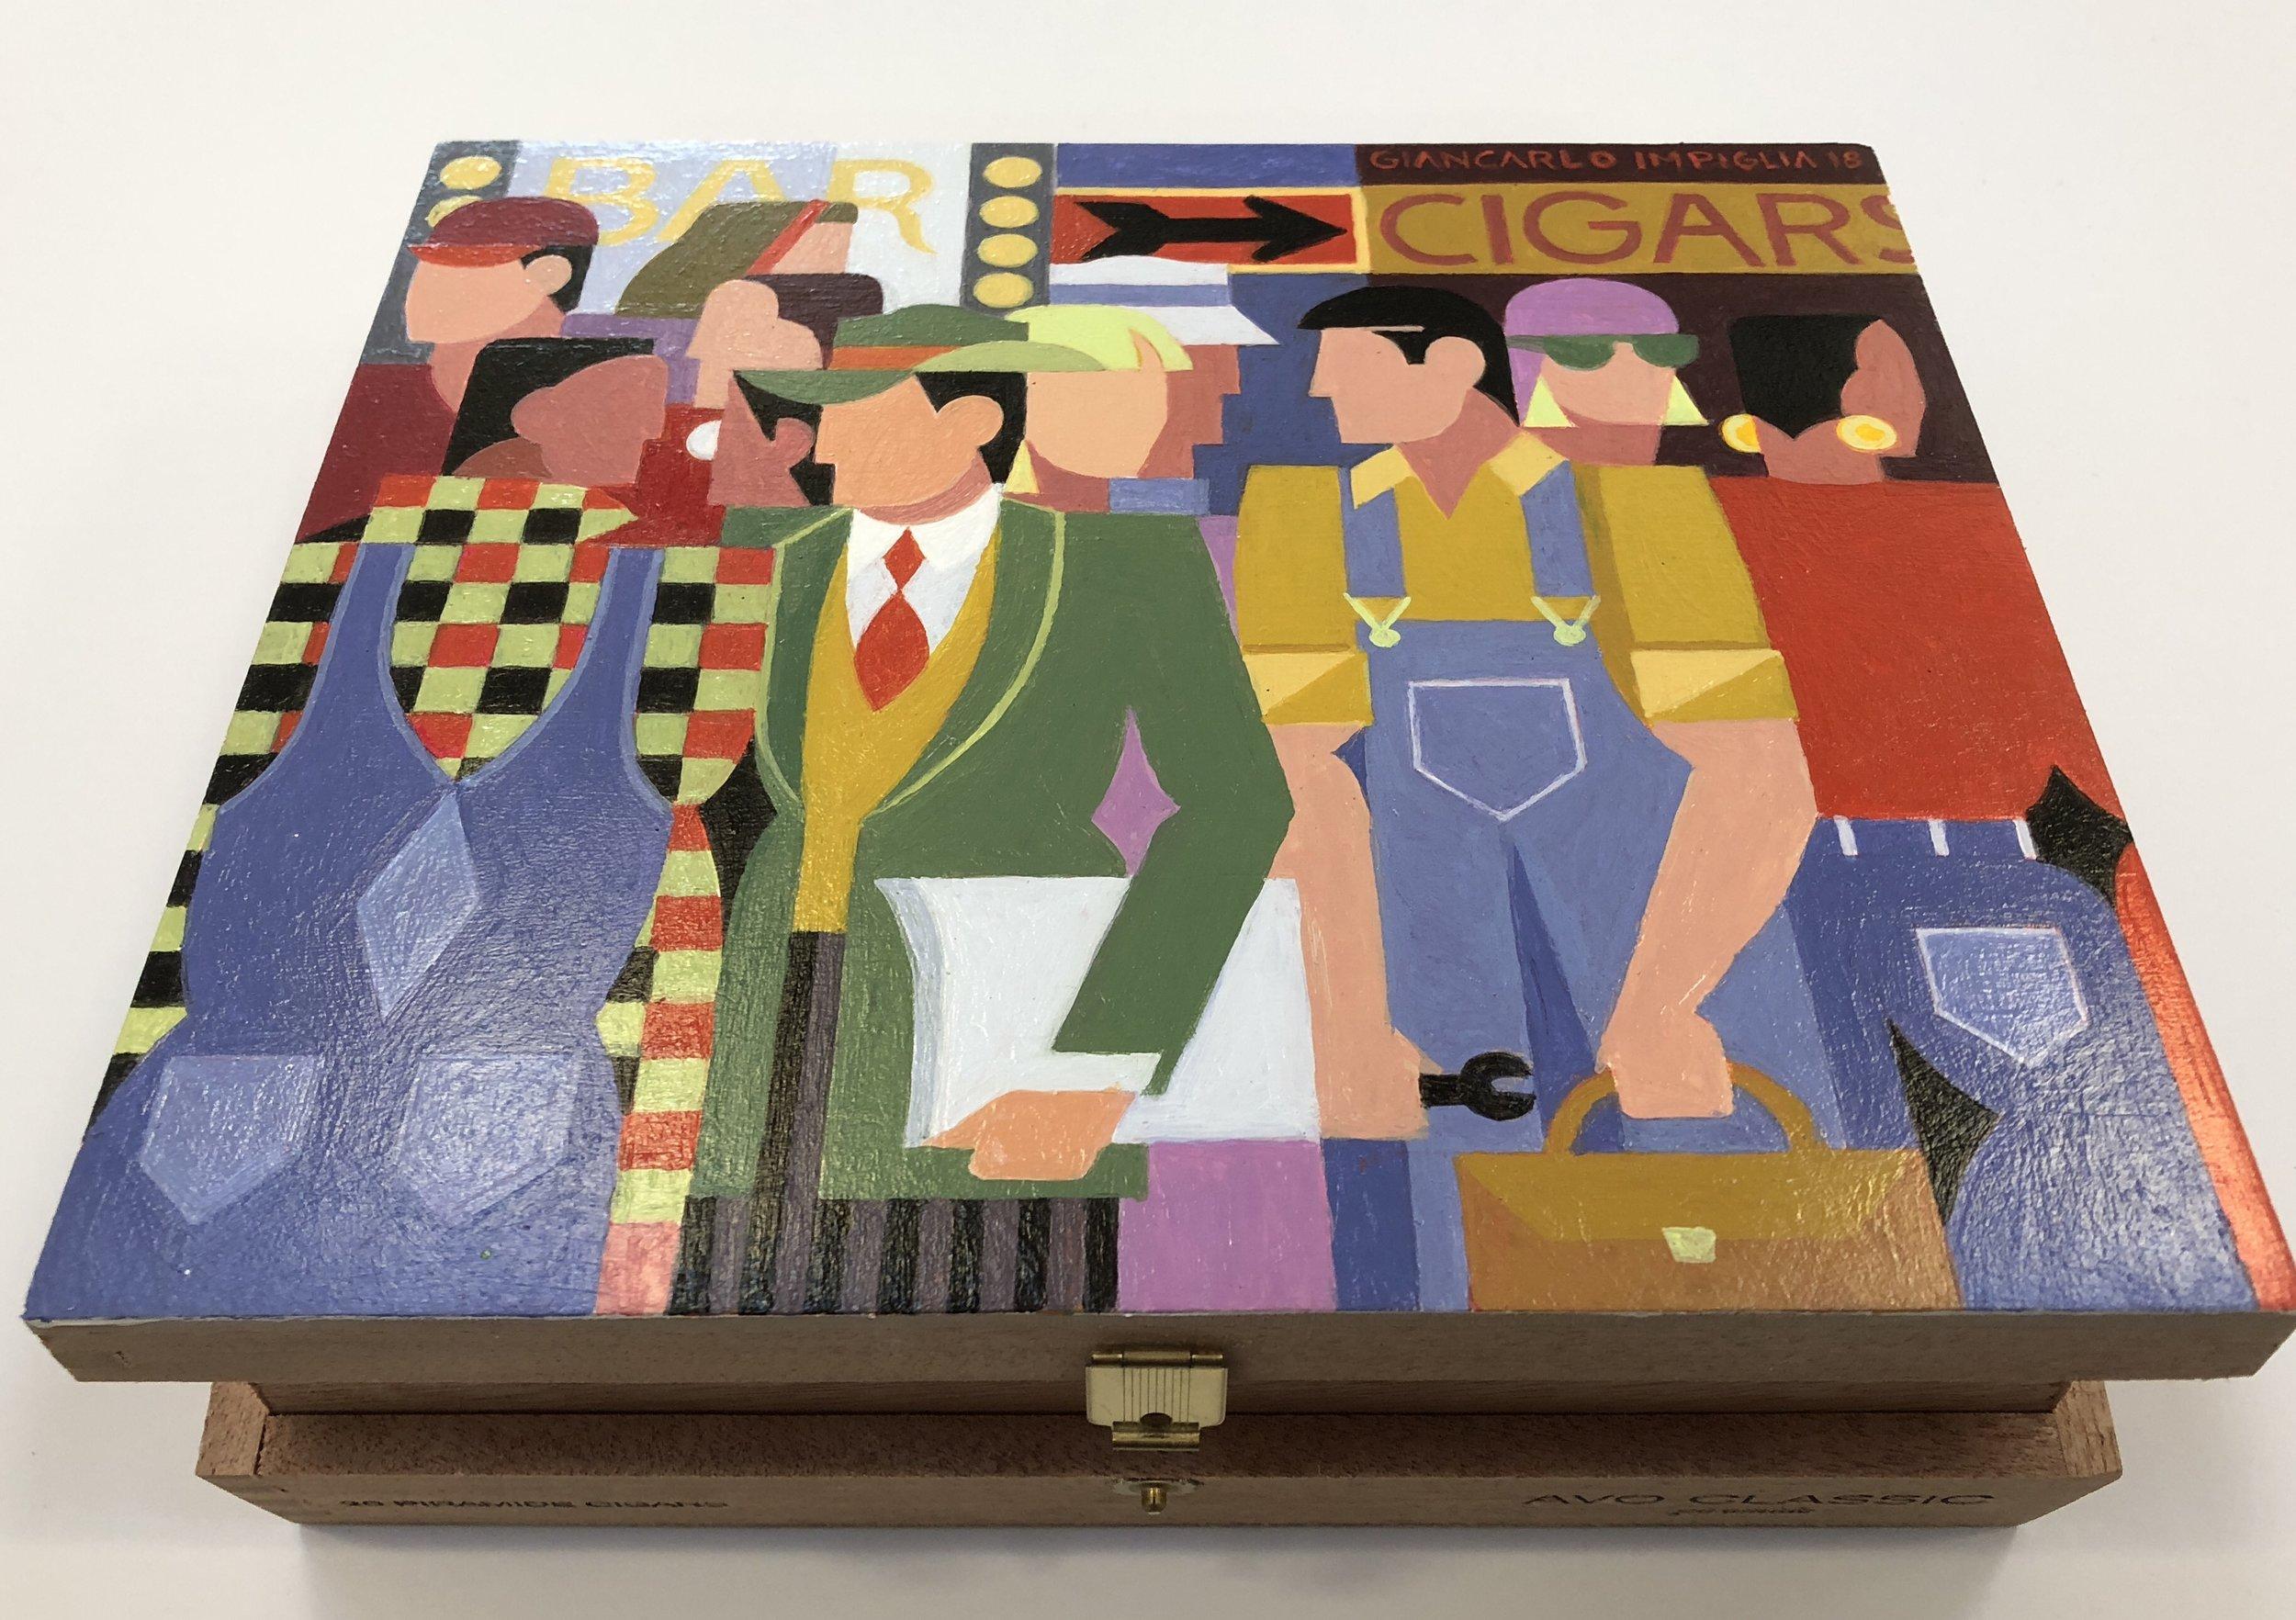 Cigar Box I, 2018, Oil on wood